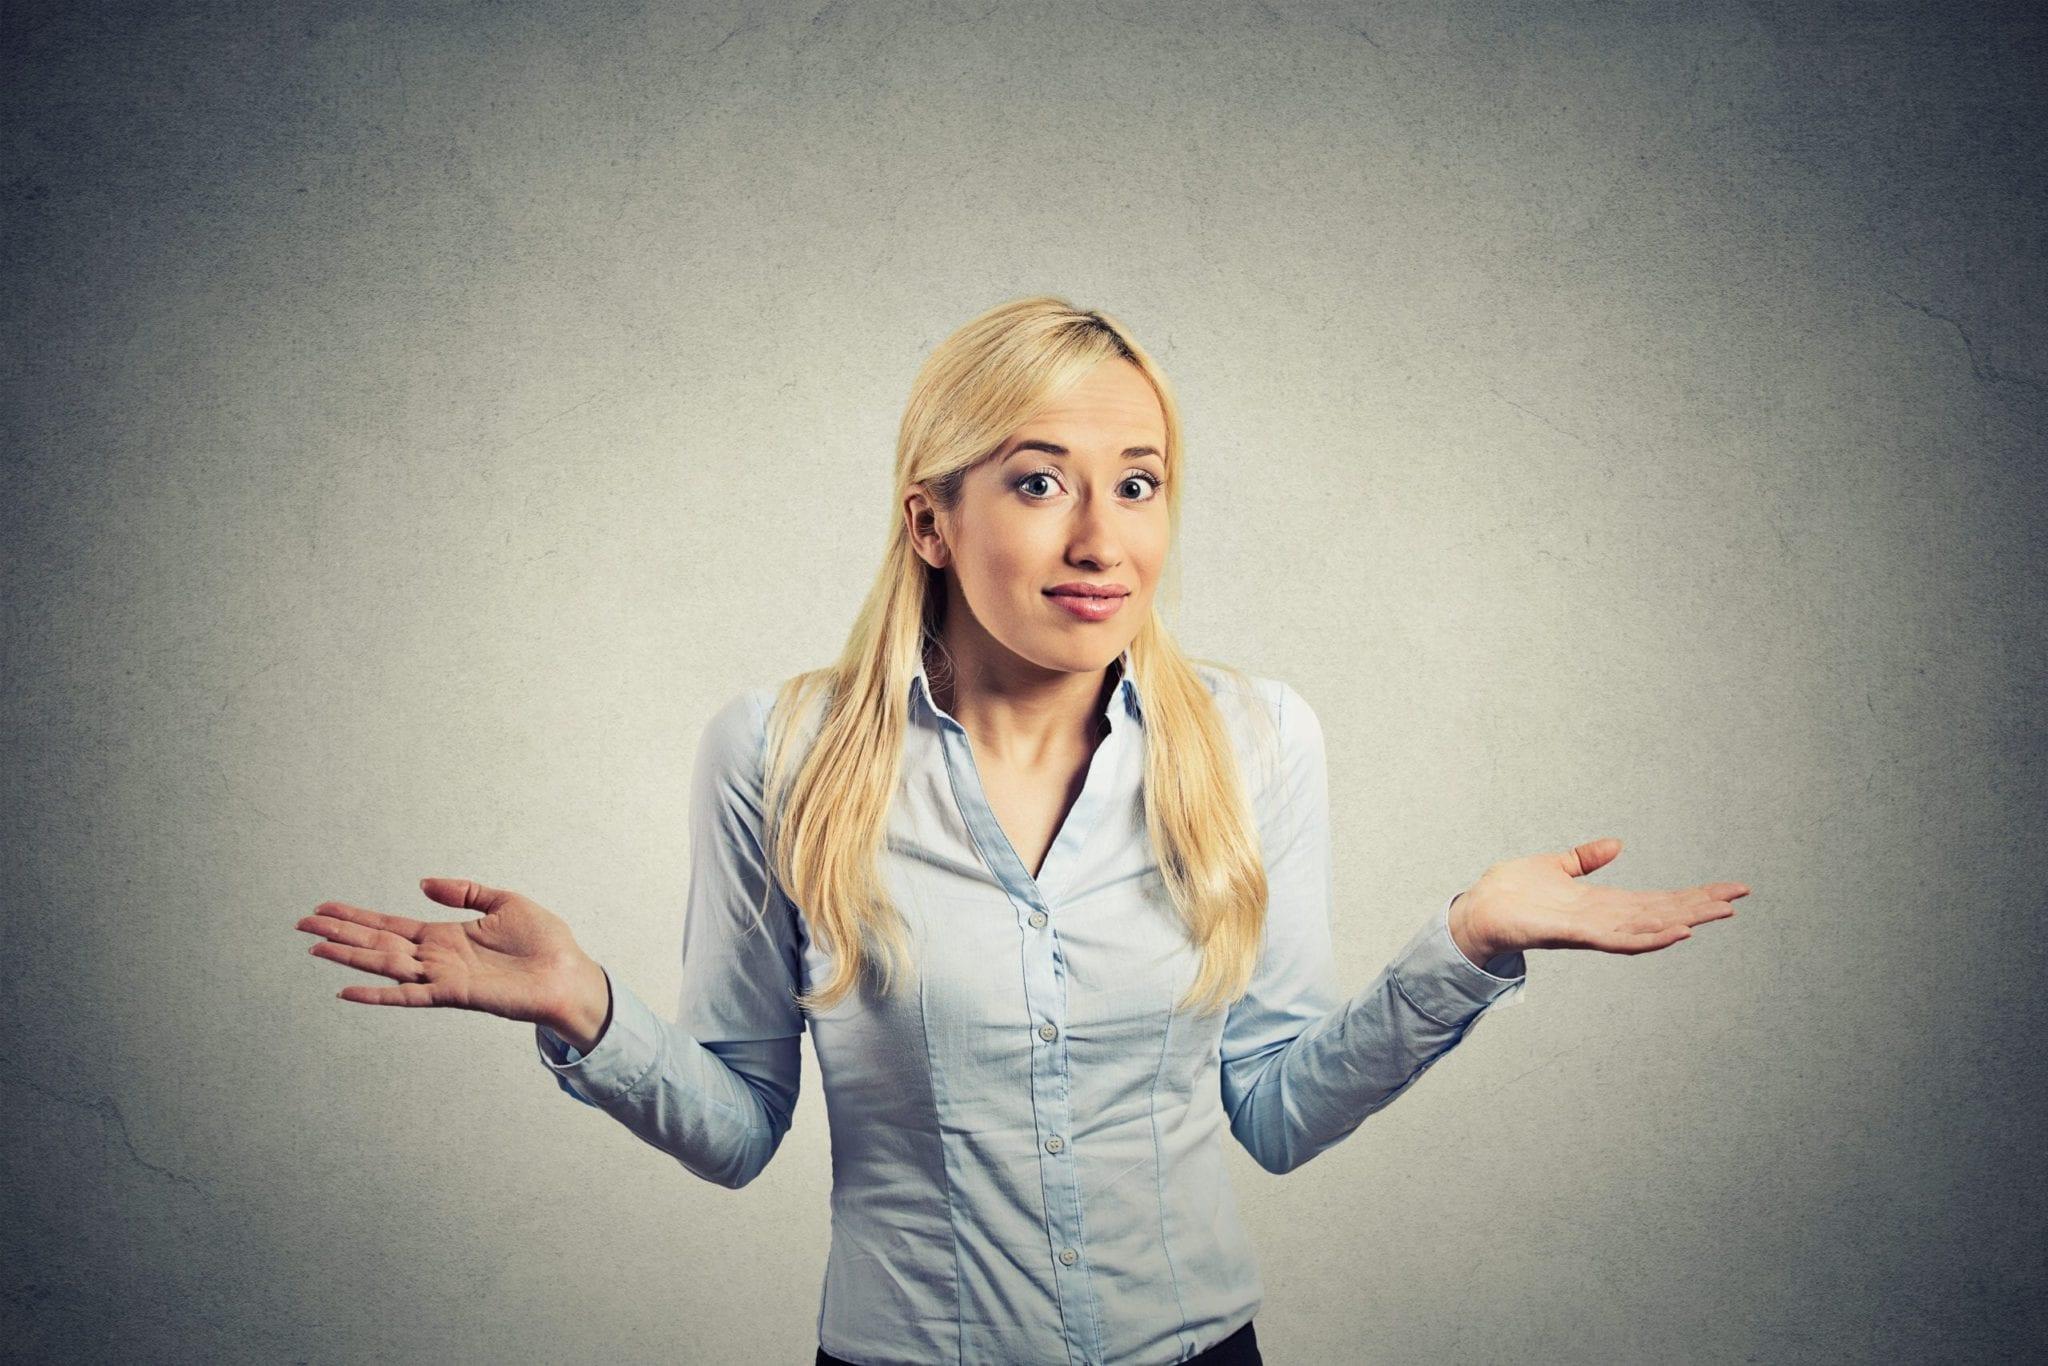 Should I Pre-teach EVERY instruction?